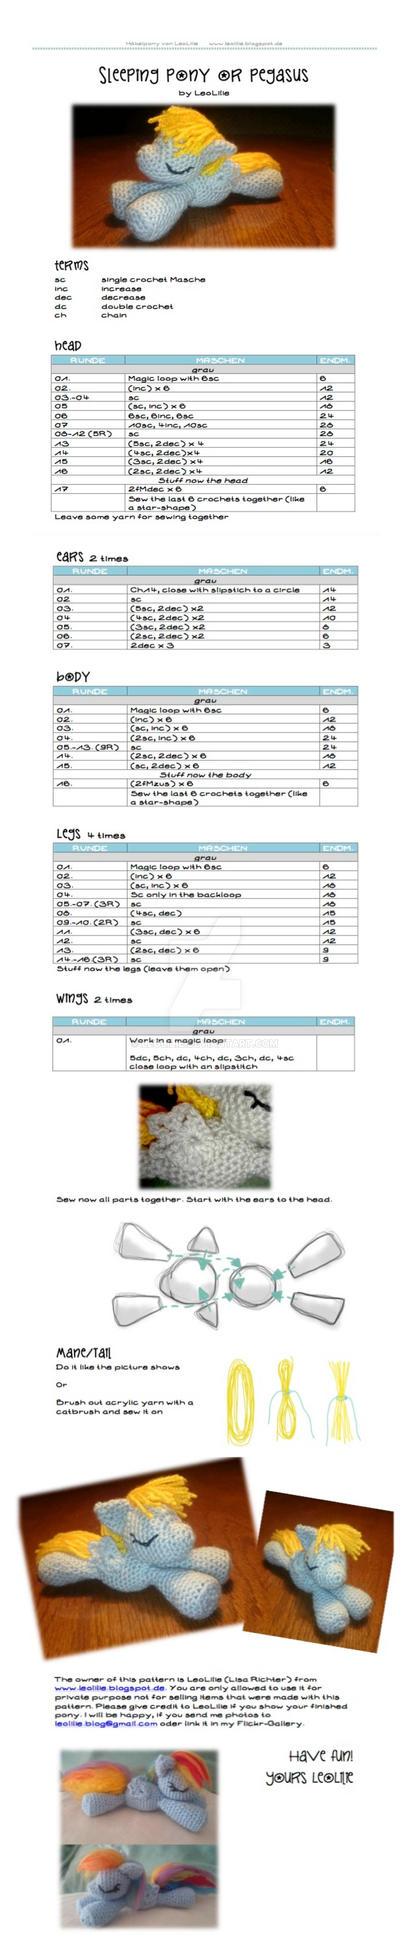 Free MLP Crochet Pattern Amigurumi Sleeping Pony o by LeoLilie